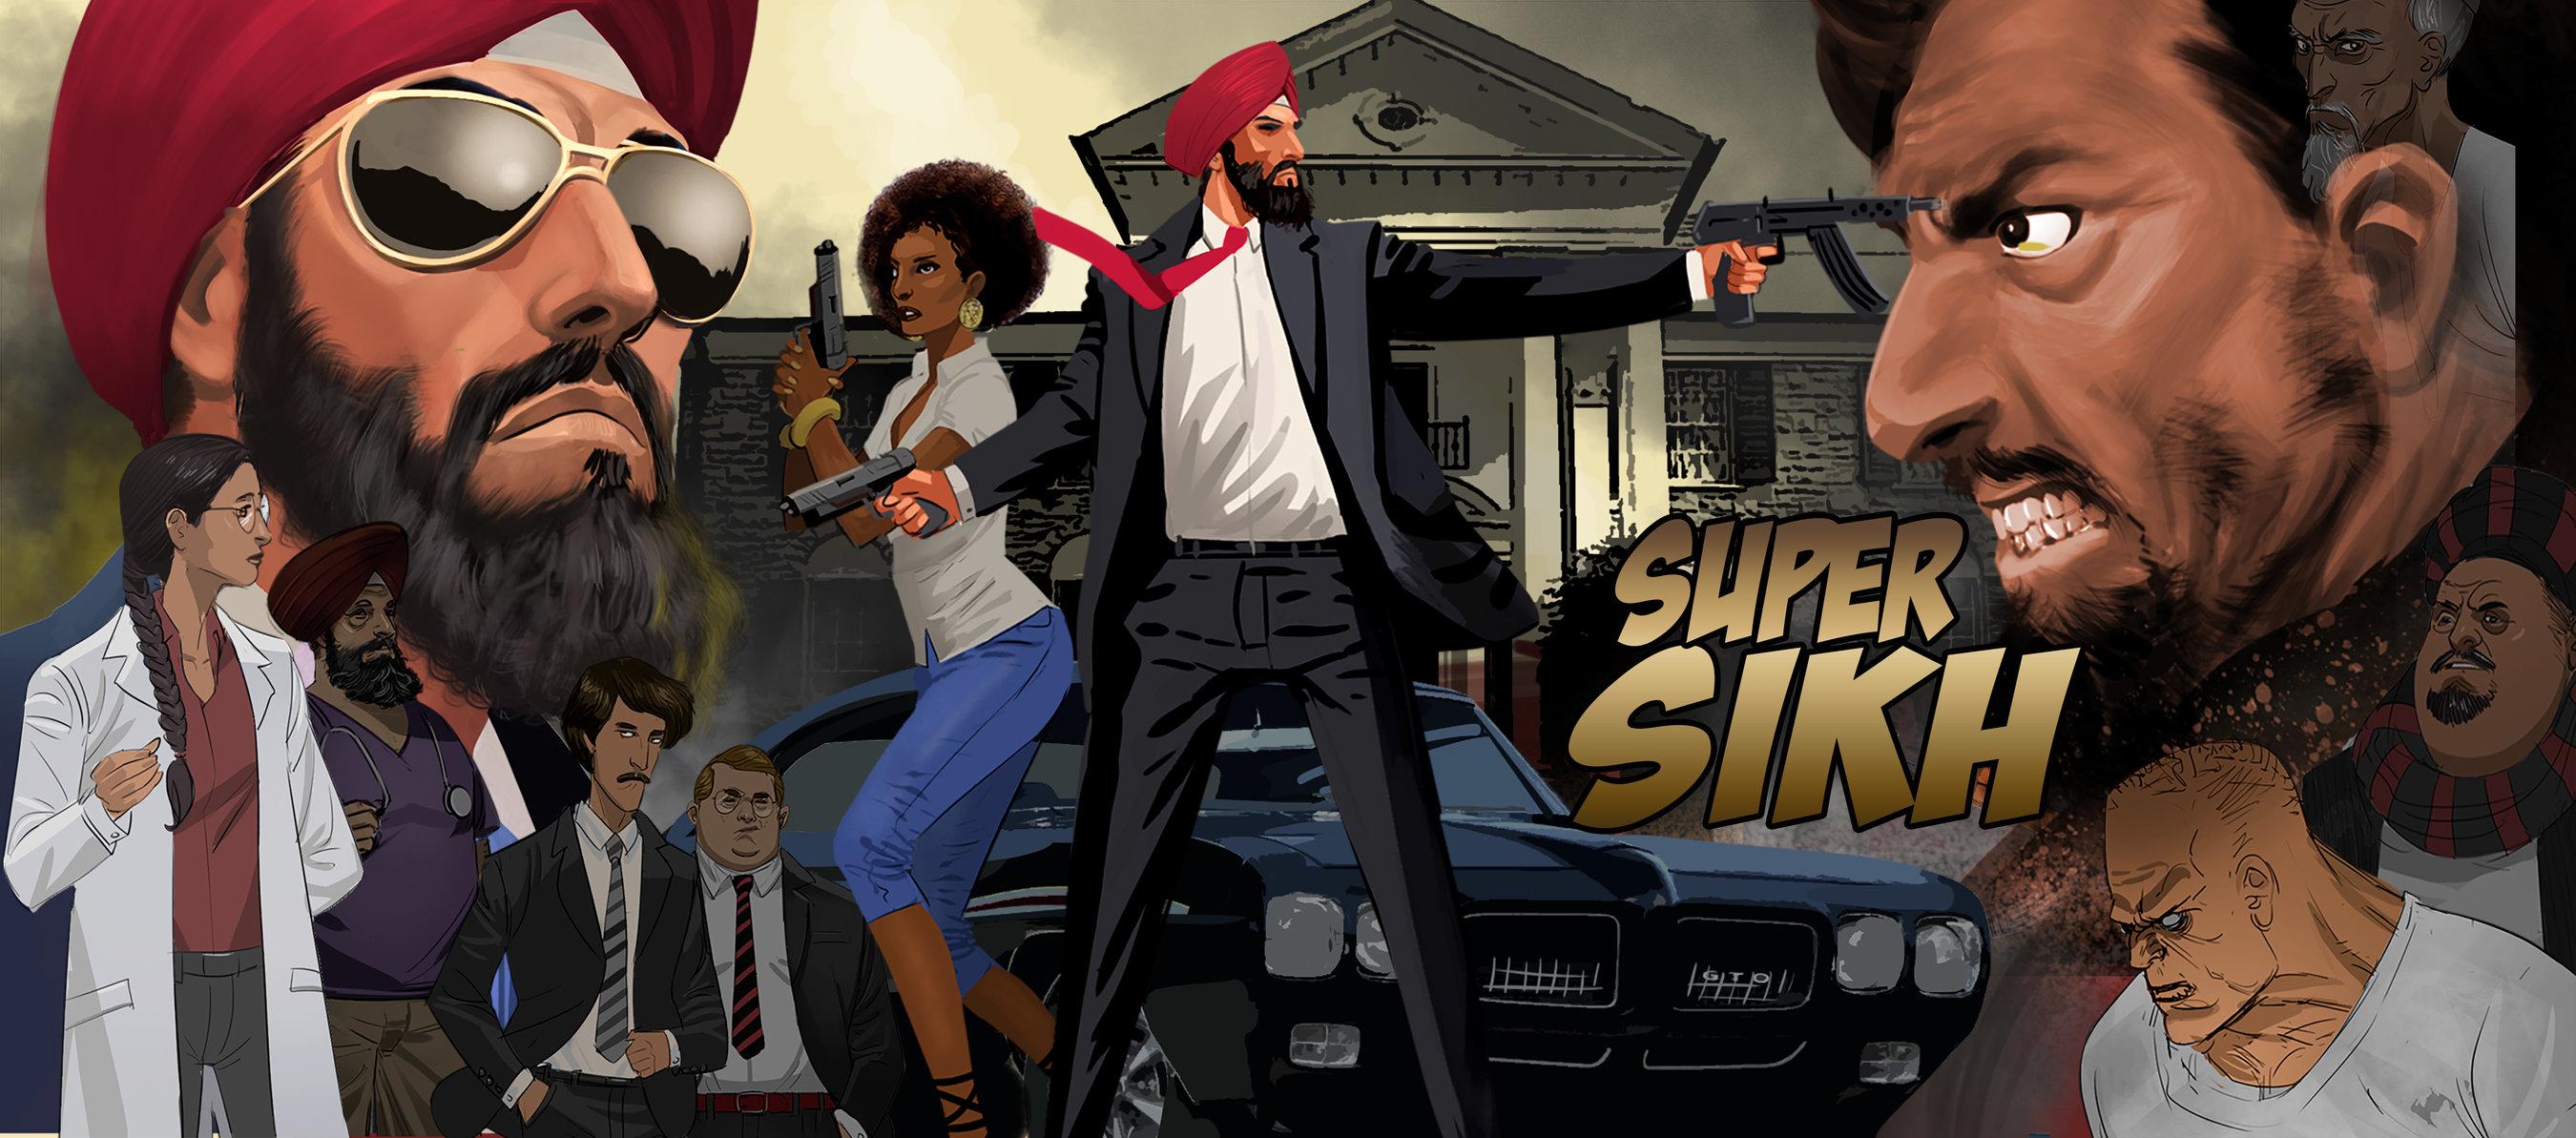 Super Sikh cartoon drawing [Eileen Alden]